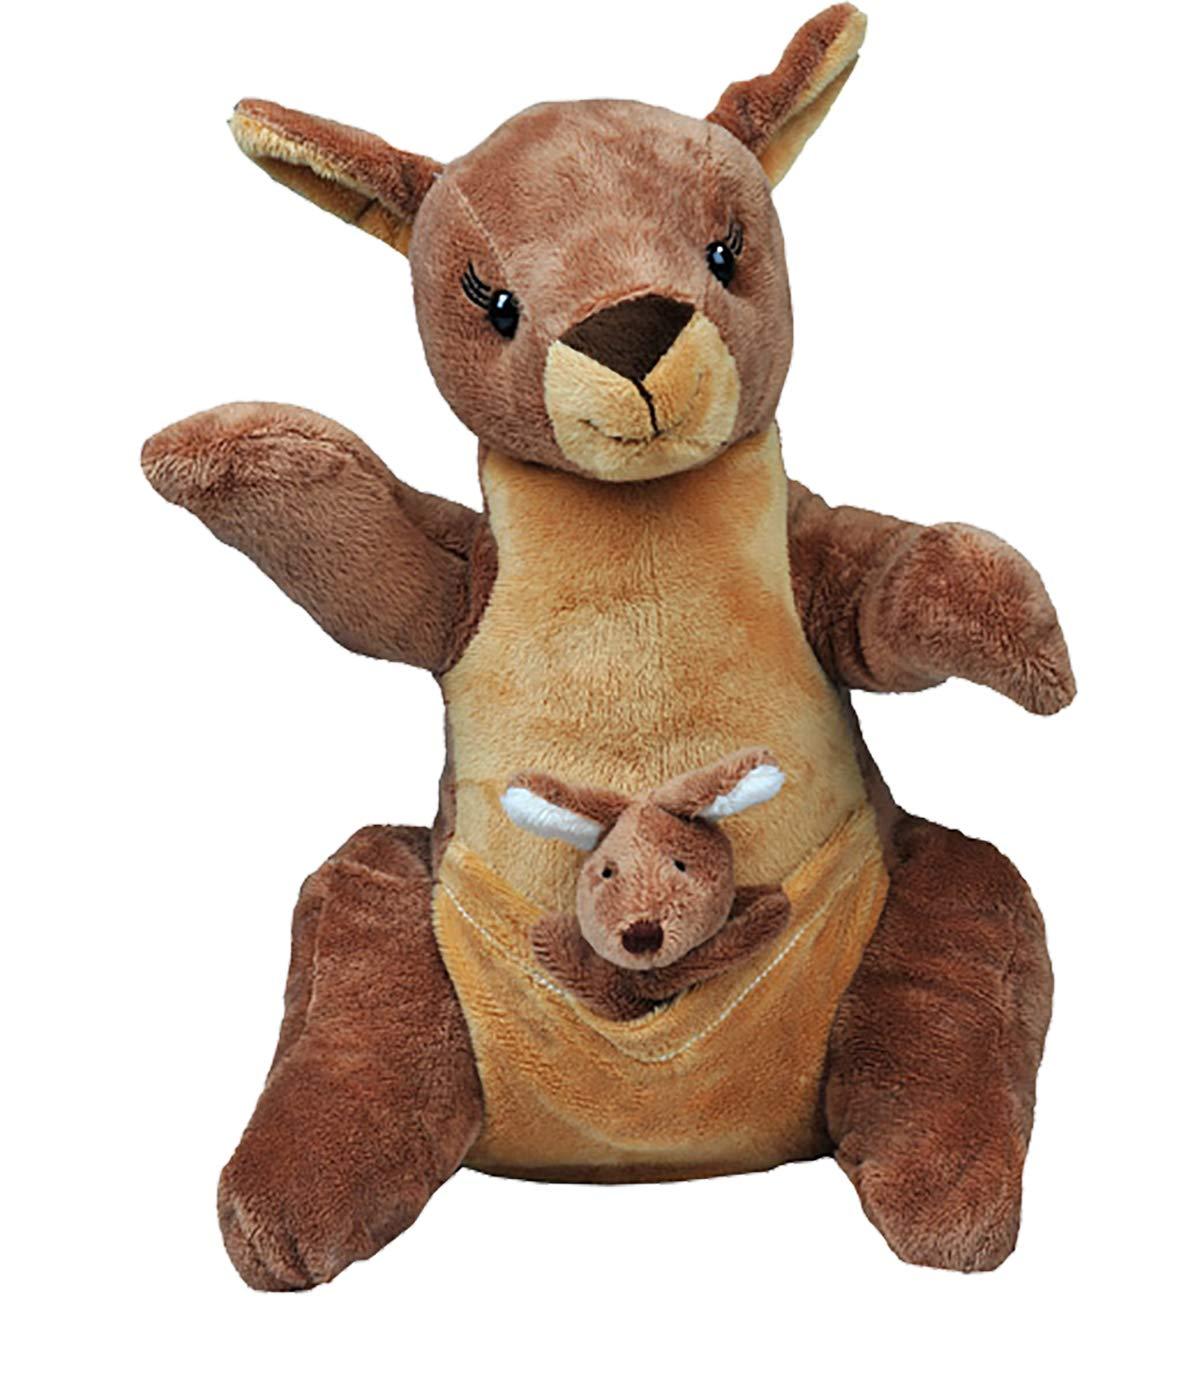 Fiesta Toys Lil Buddies Bean Bag Animal Plush 7 Eagle Nixeus Technologies Inc A58284